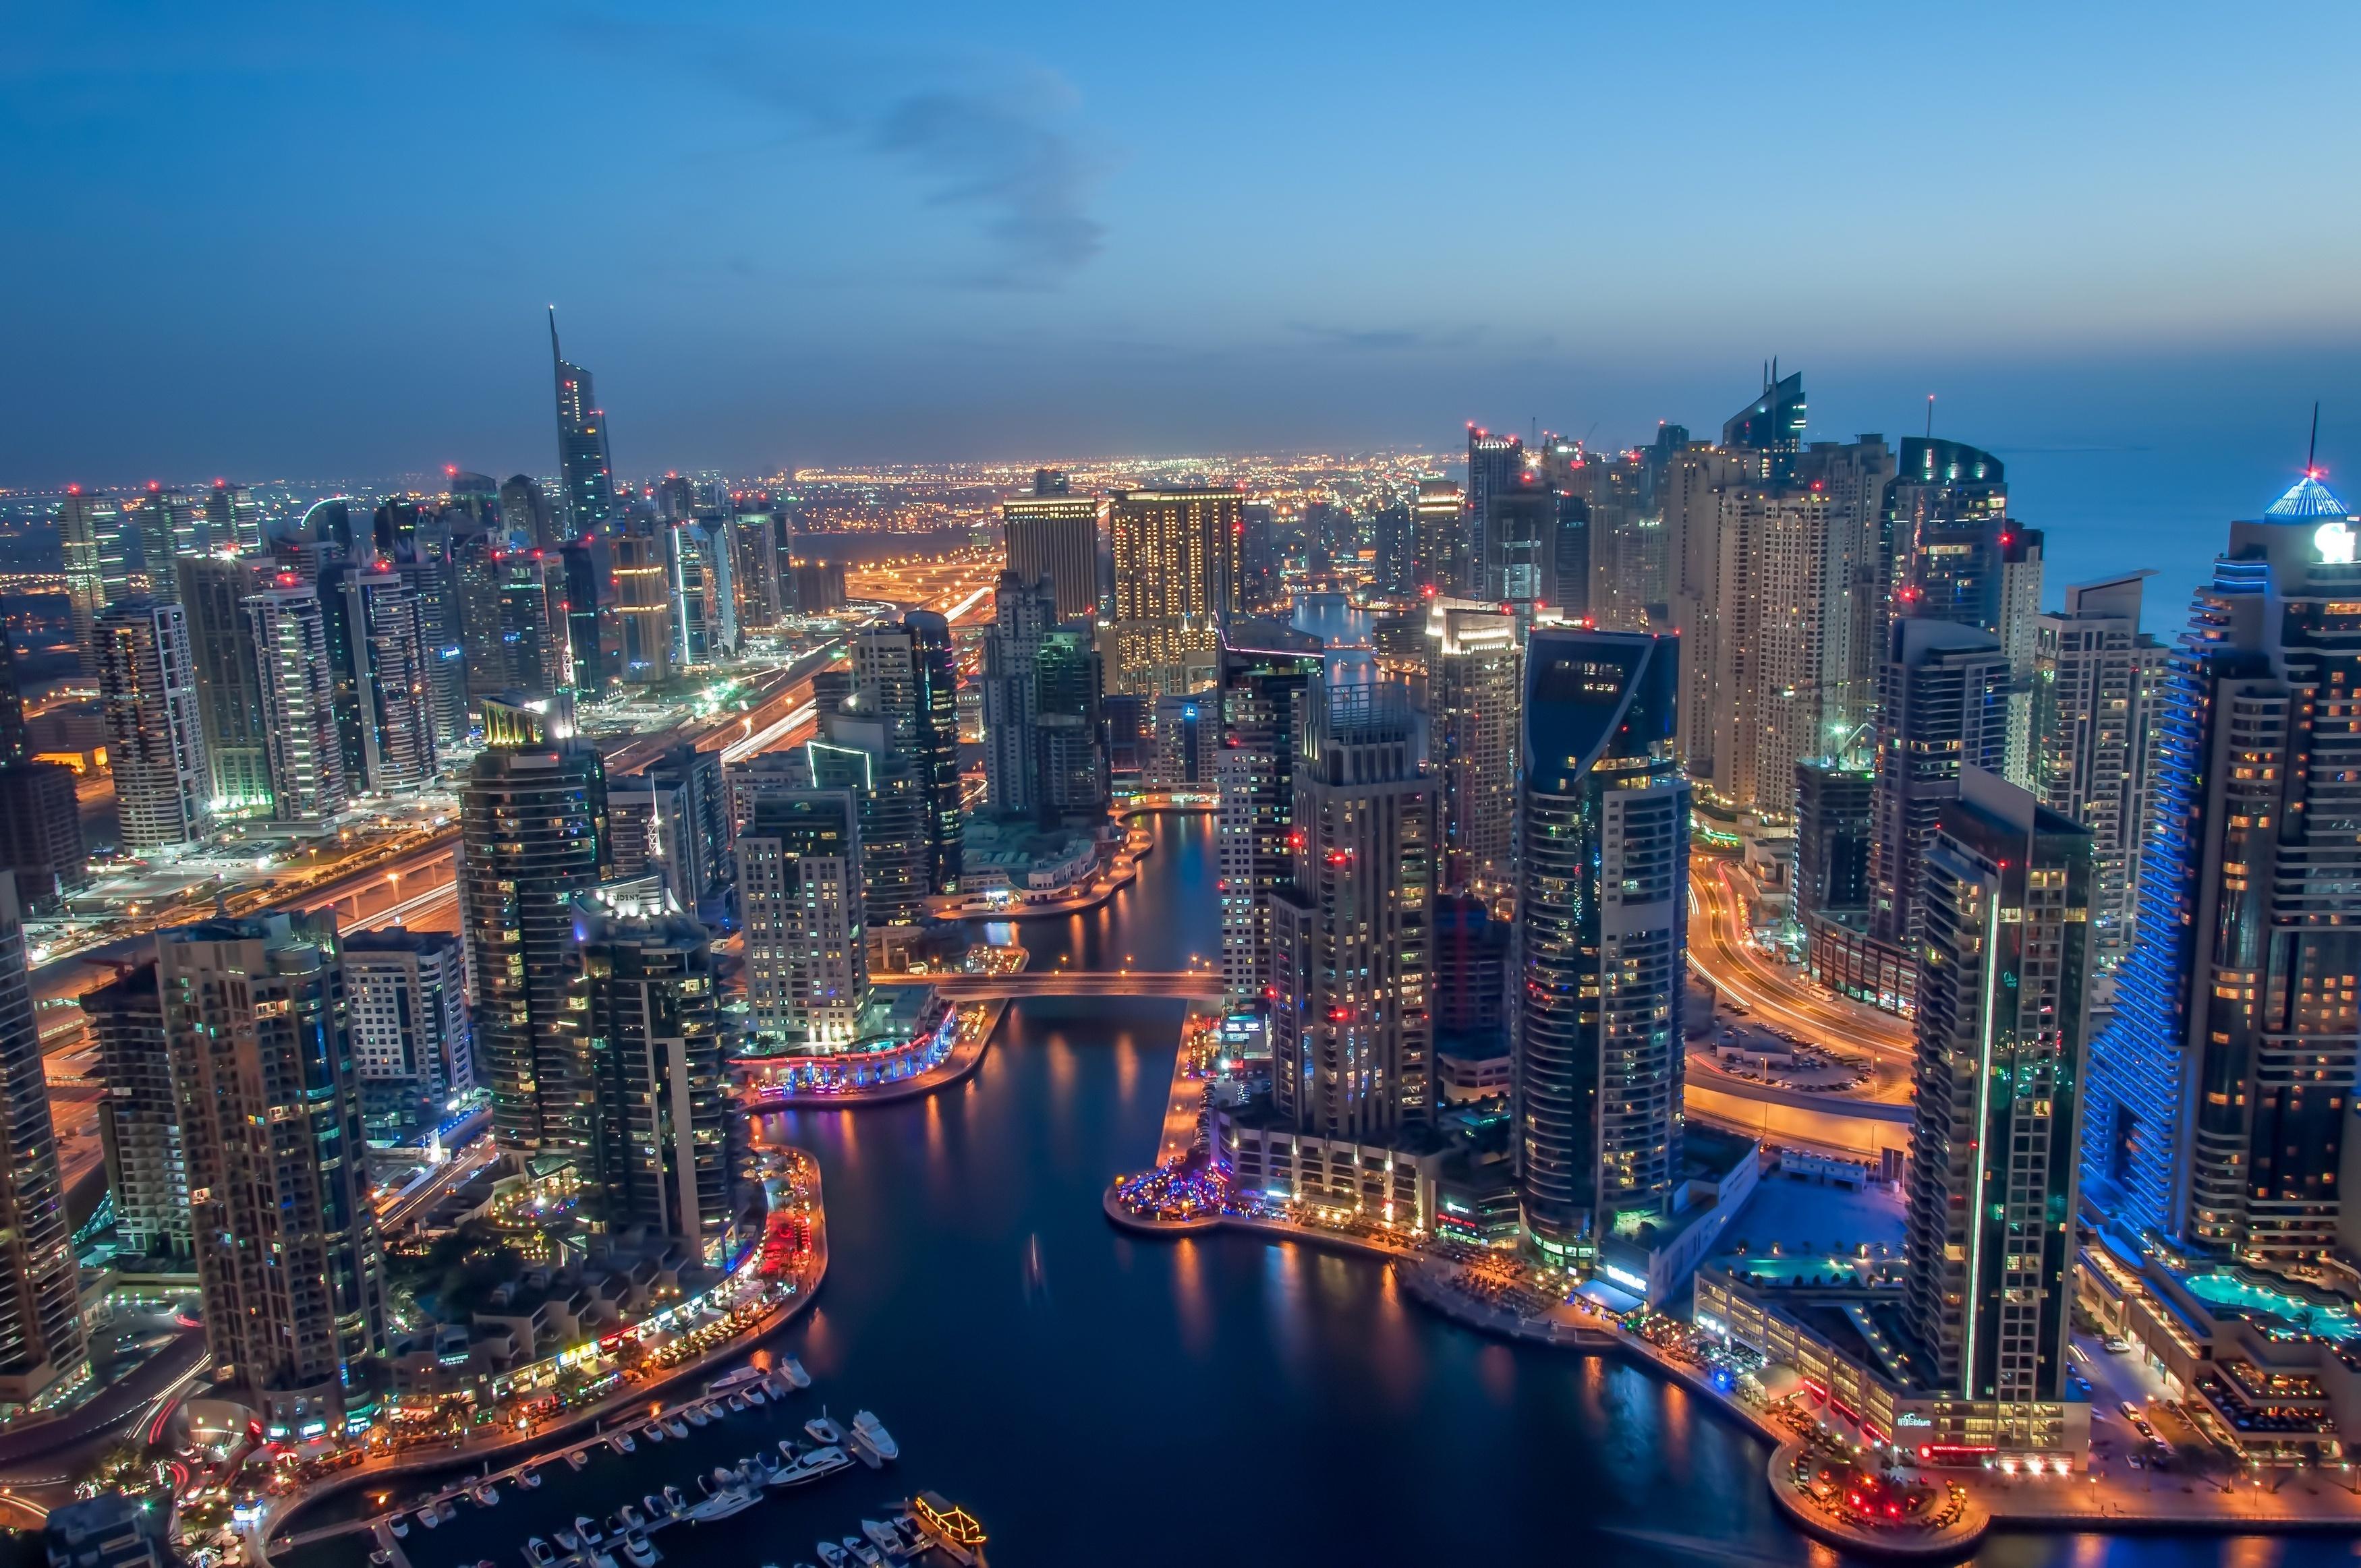 дубаи марина огни город высота Dubai Marina lights the city height загрузить